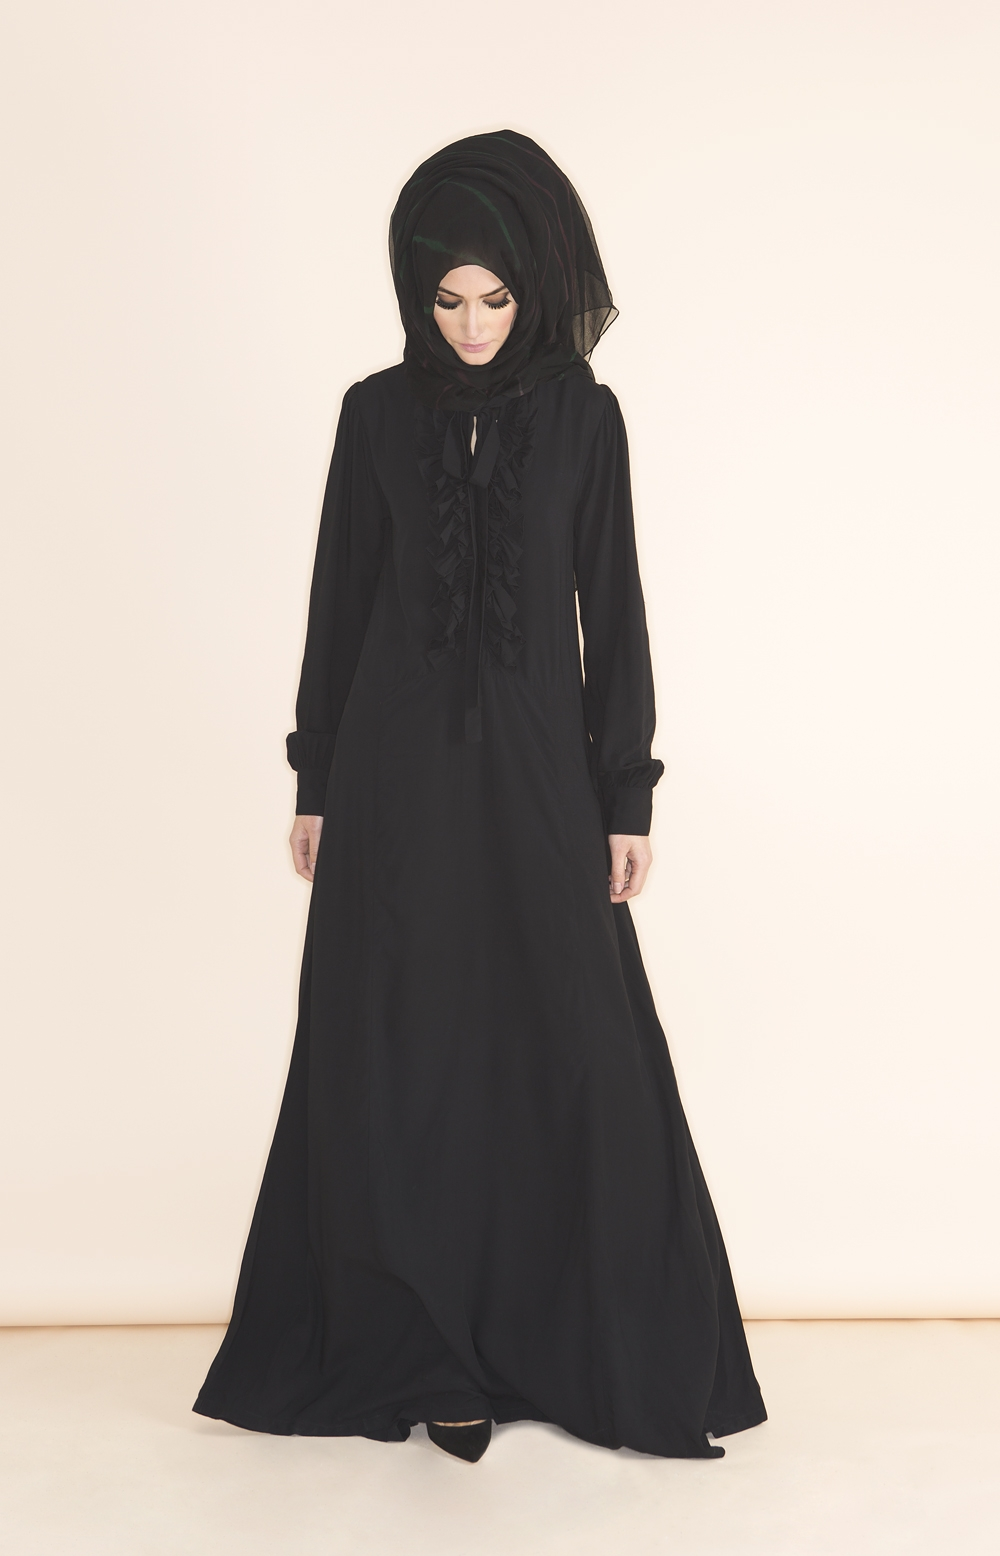 10 Contoh Model Baju Muslim Terbaru 2020 Model HIjab